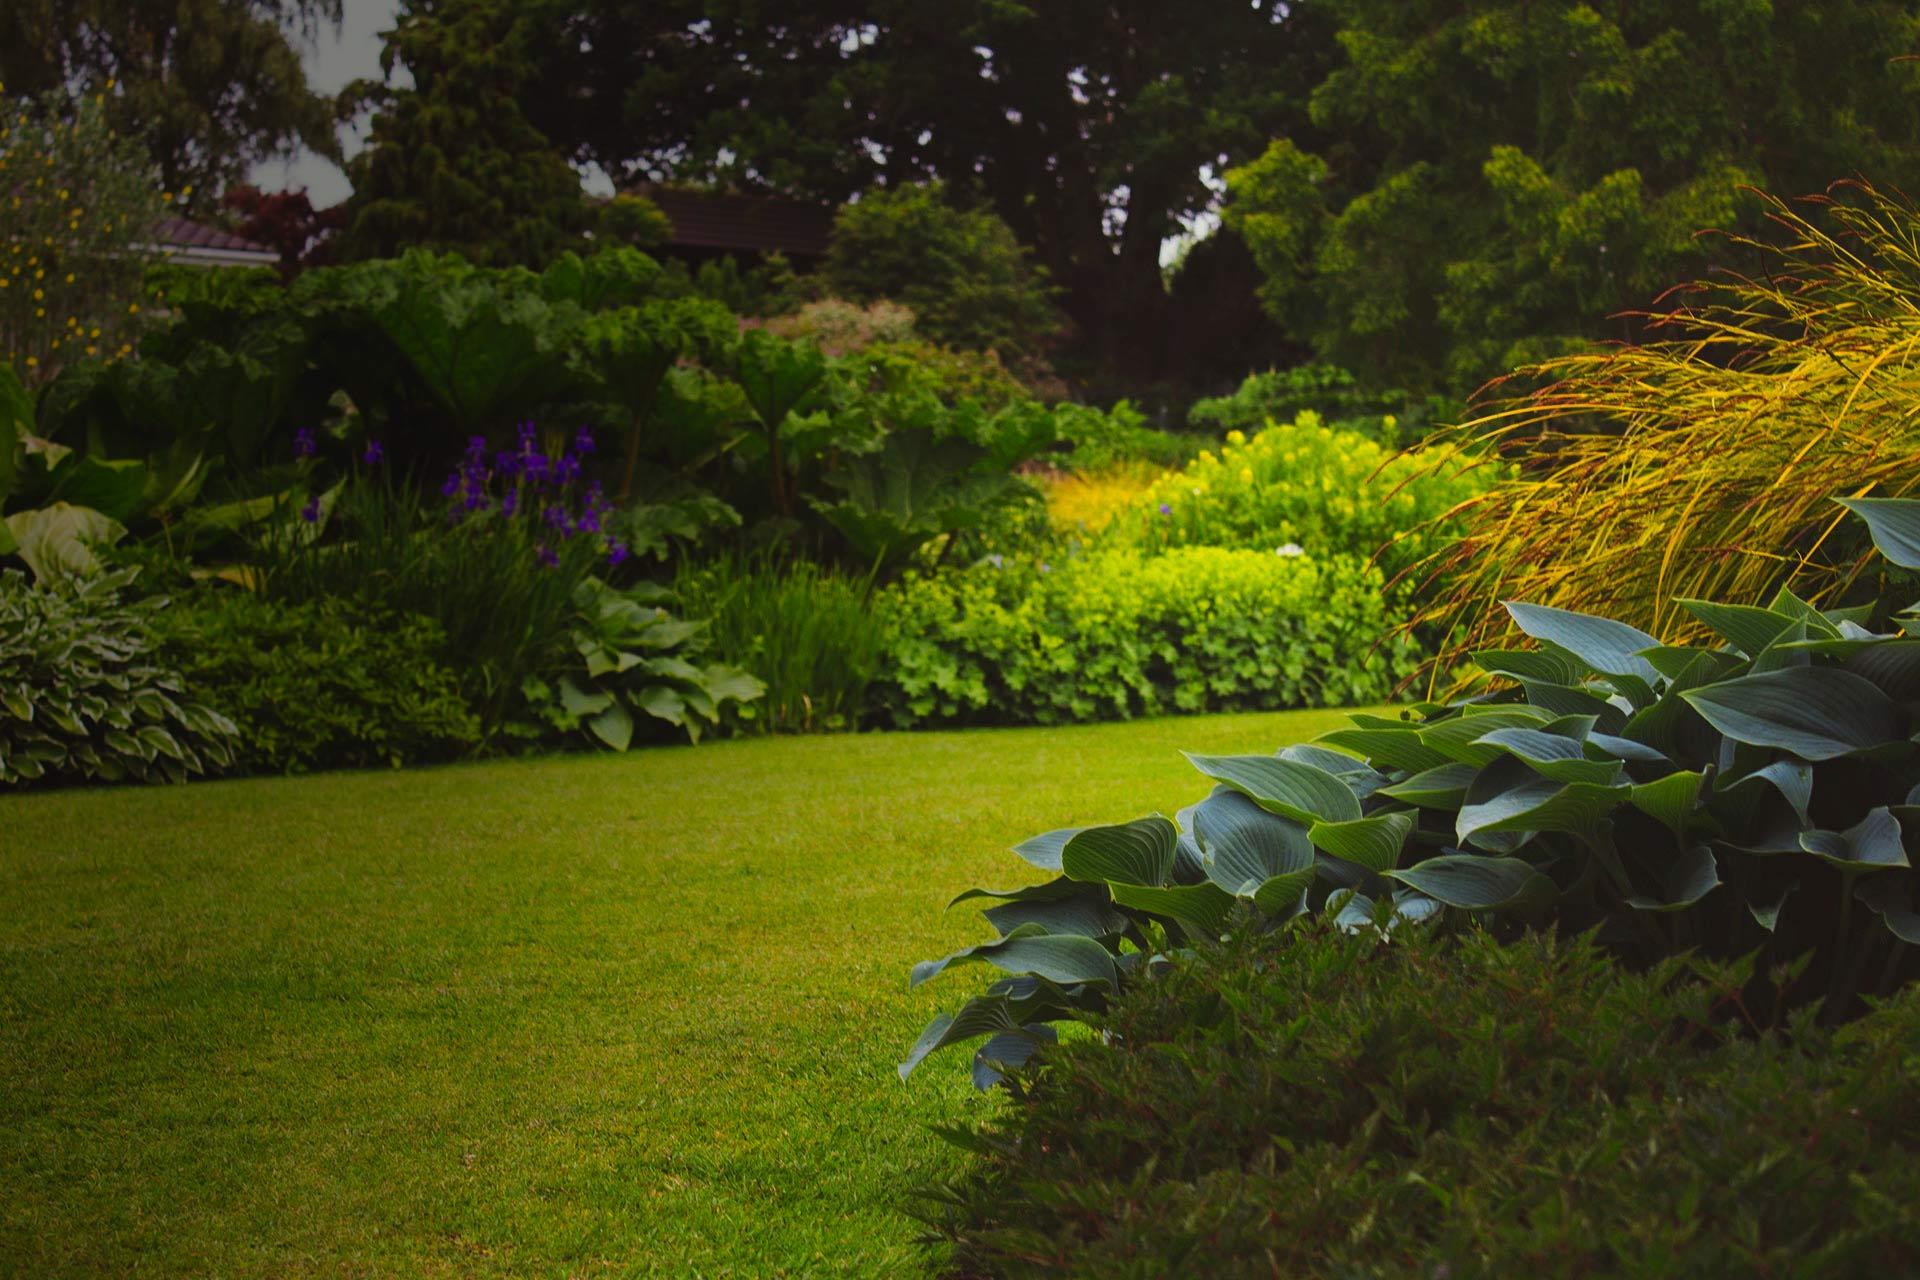 Entretien de jardins entretien de jardins nancy taille for Entretien de jardins